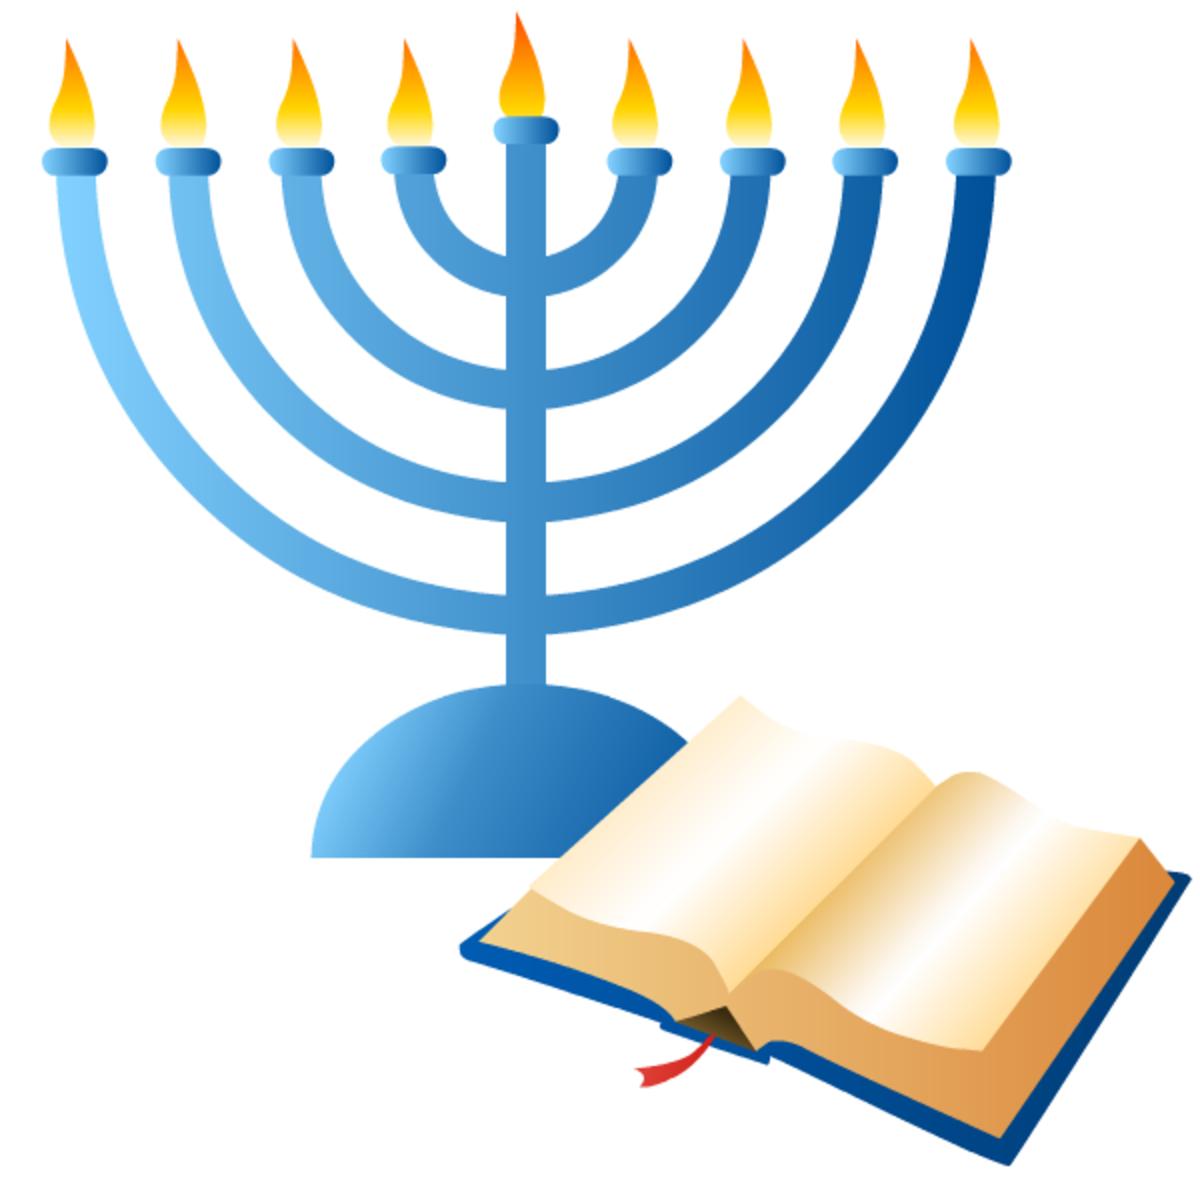 Hanukkah symbols: menorah and holy book